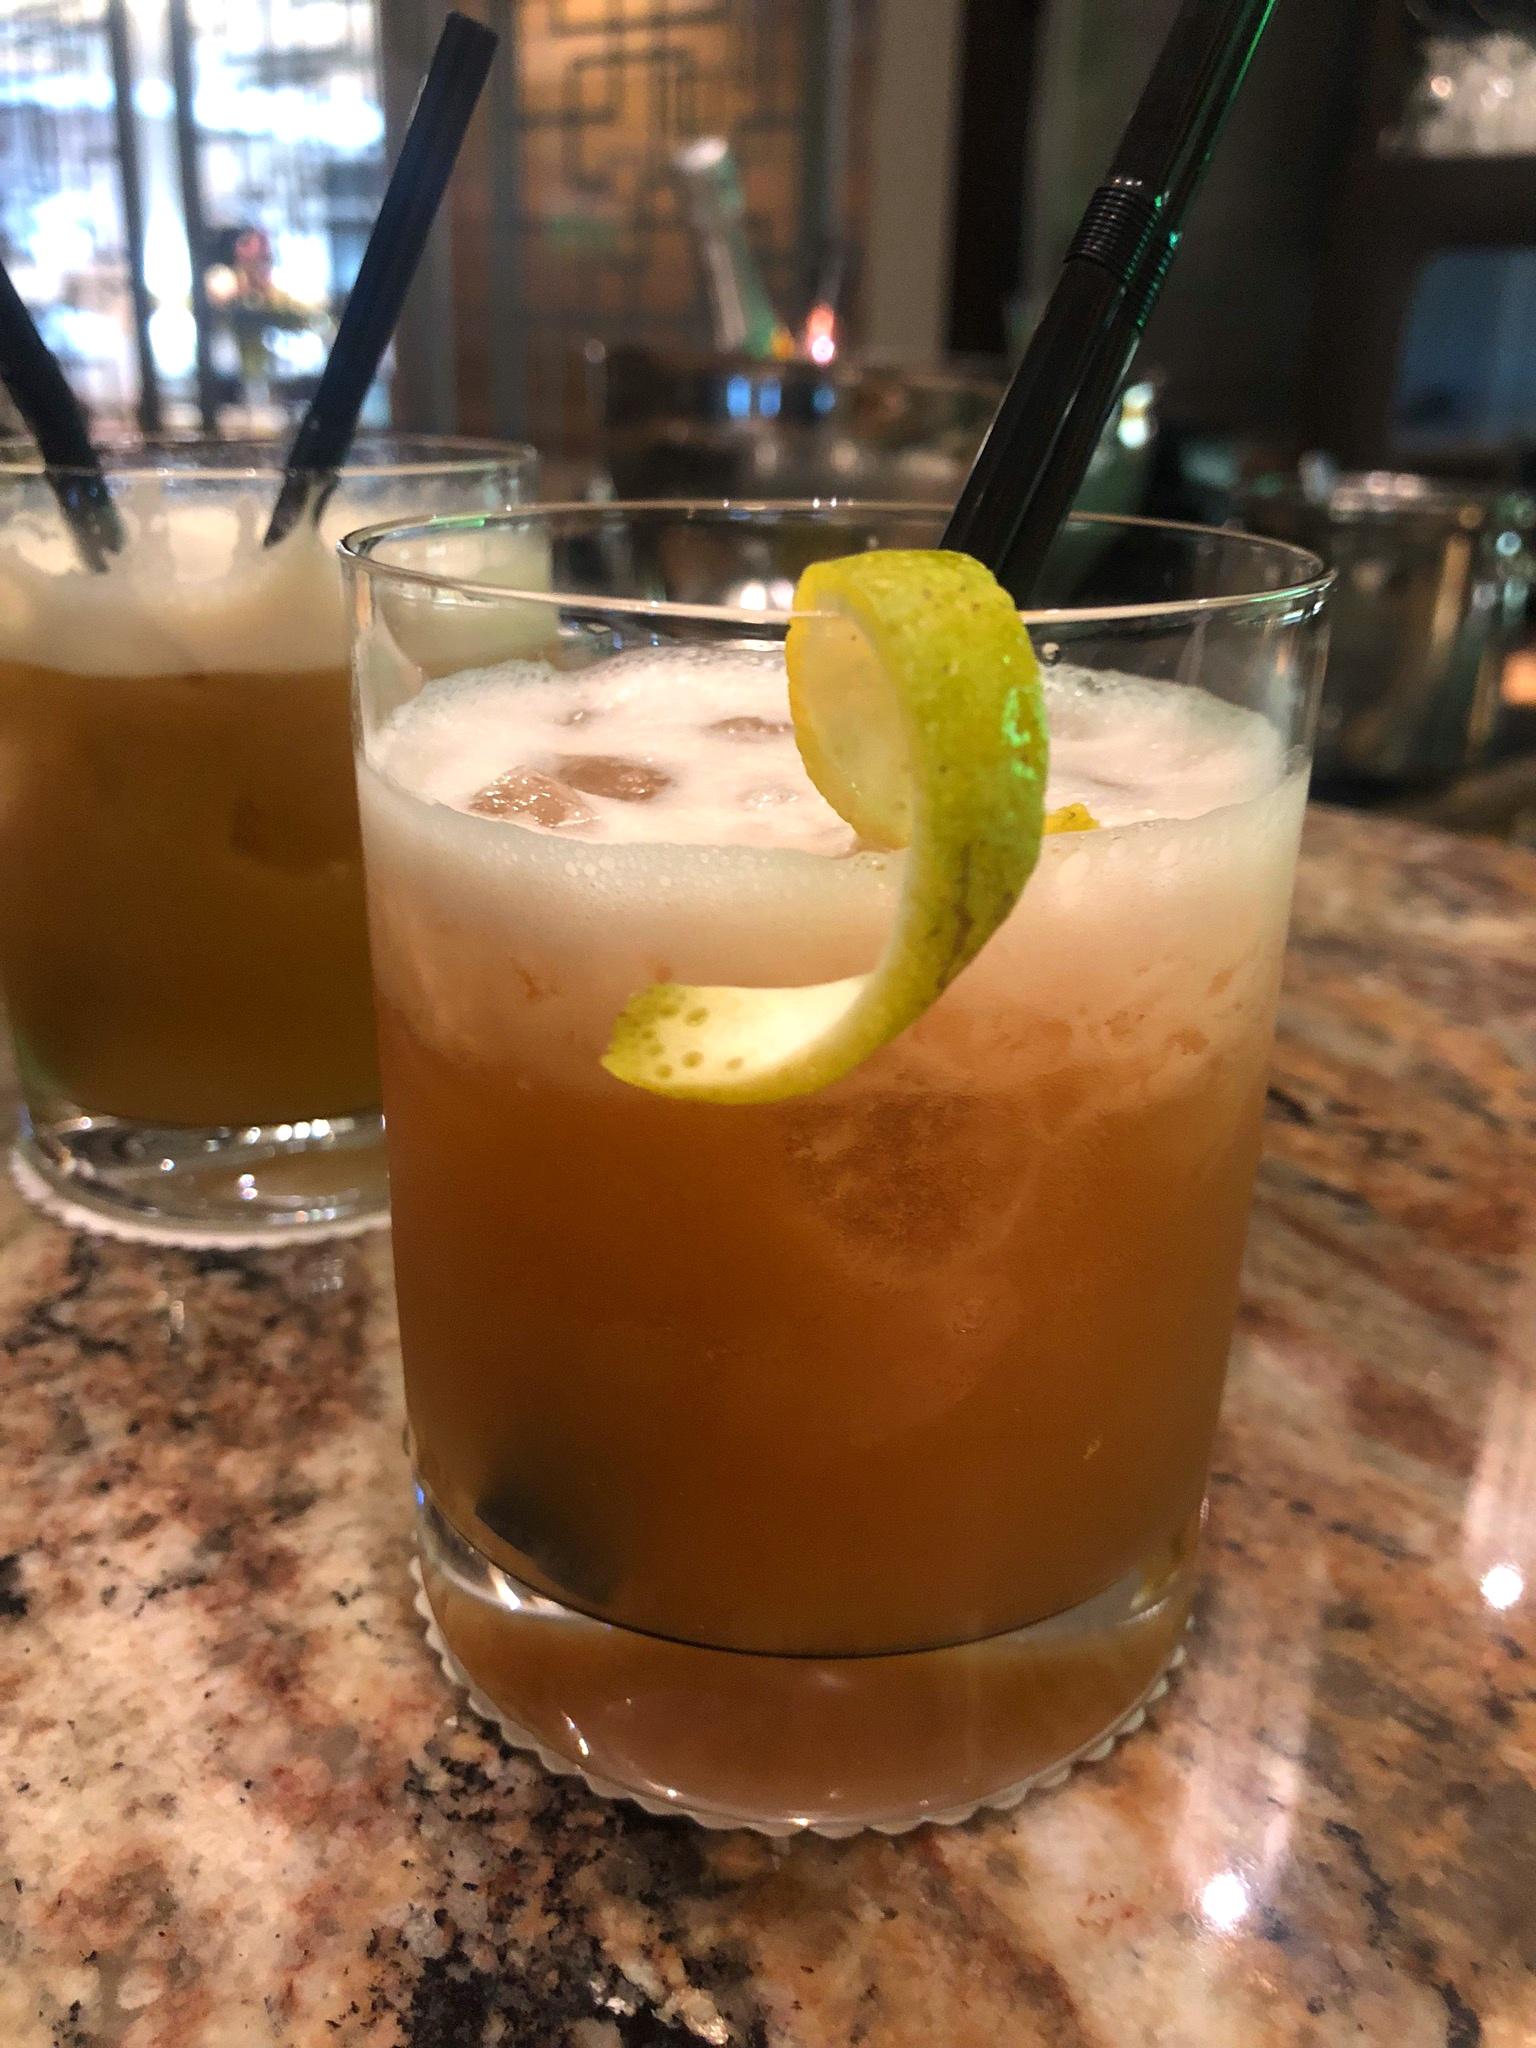 L-R: Primavera and Whiskey Sour